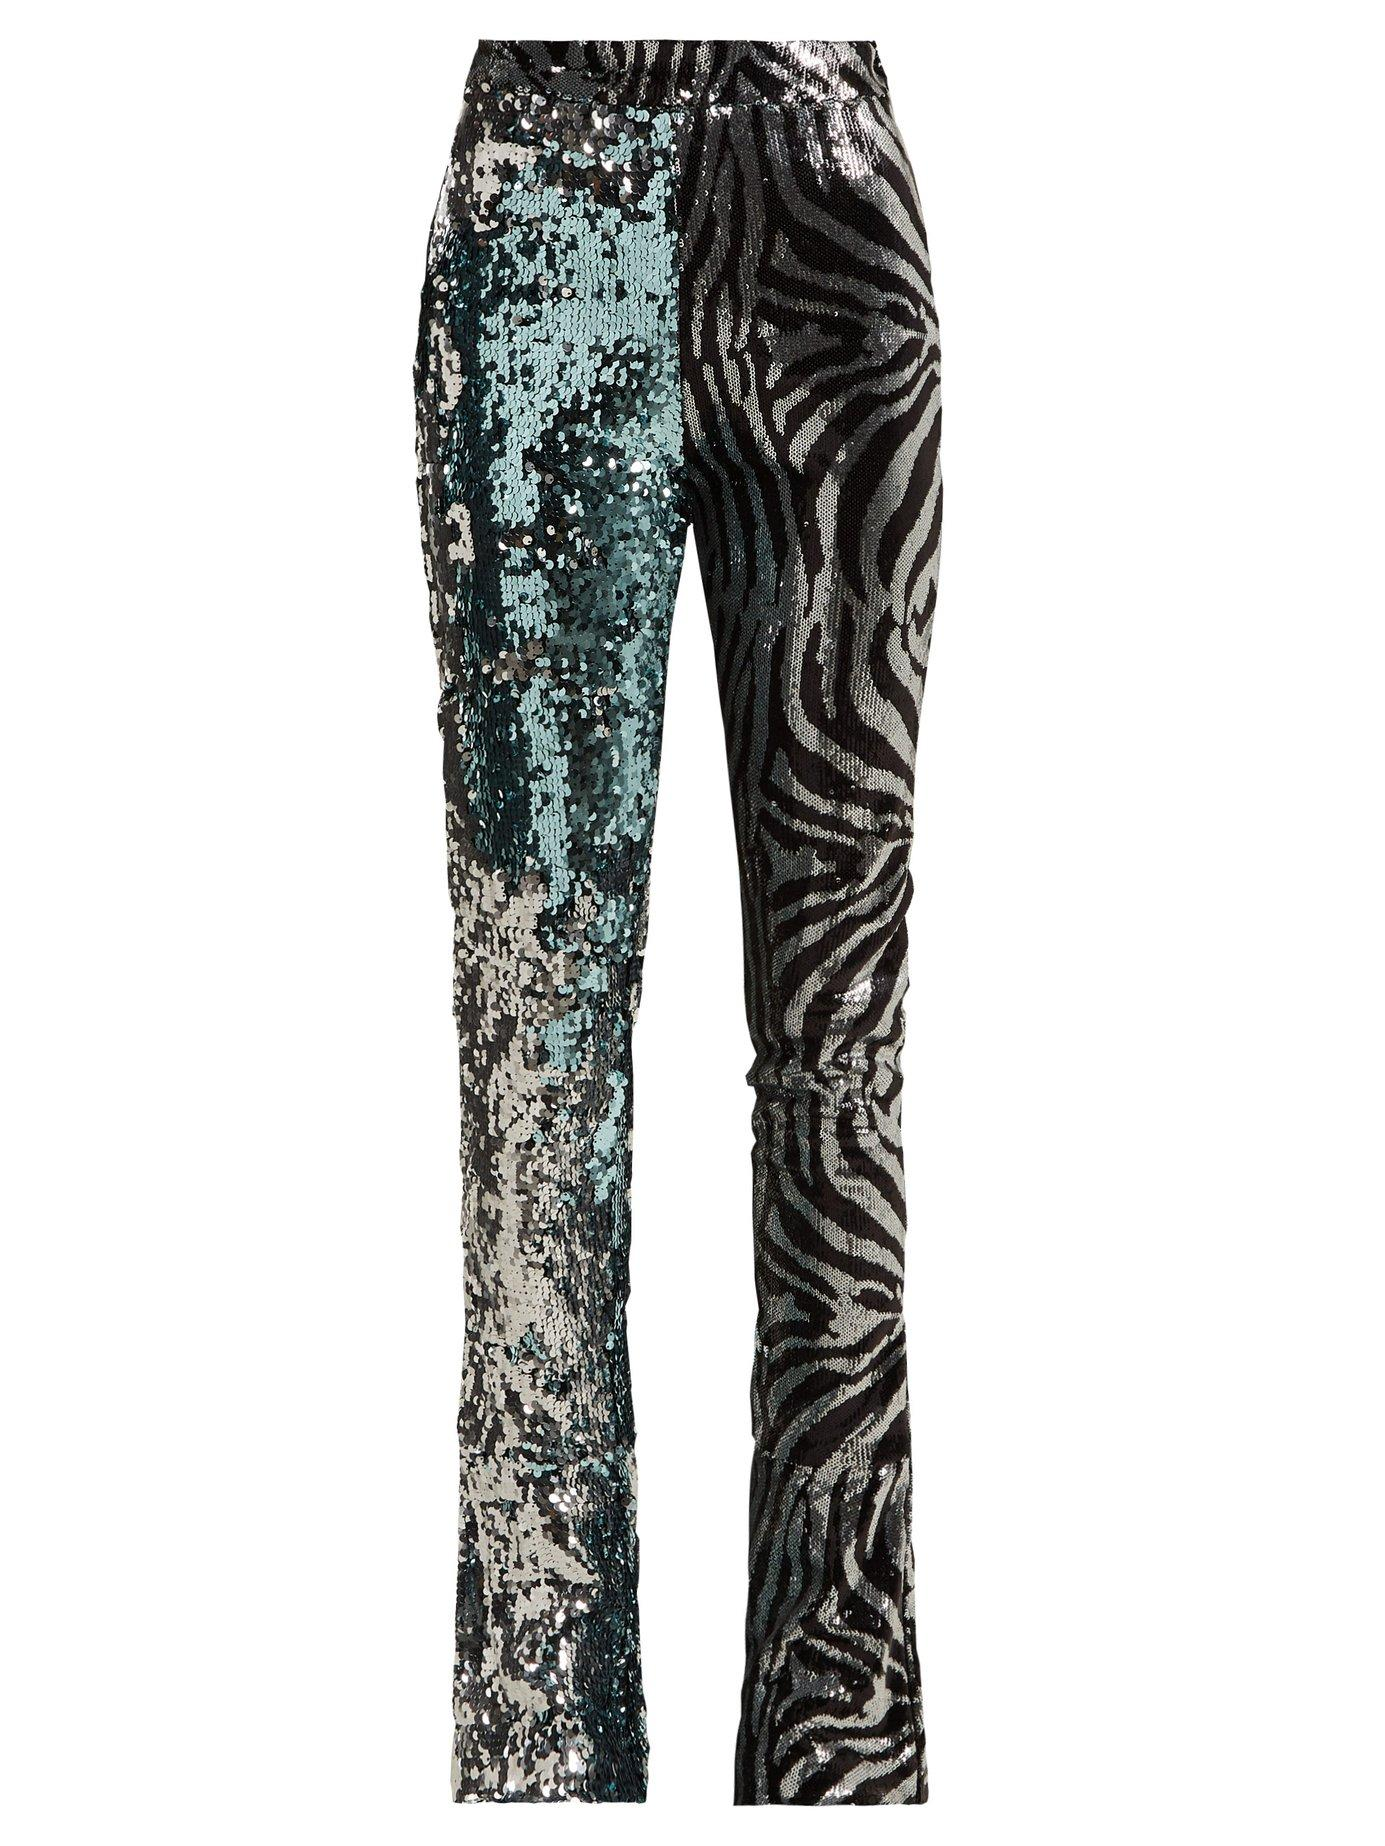 fdfef8dc44f Halpern - Sequined Slim Leg Flared Trousers - Womens - Light Blue ...